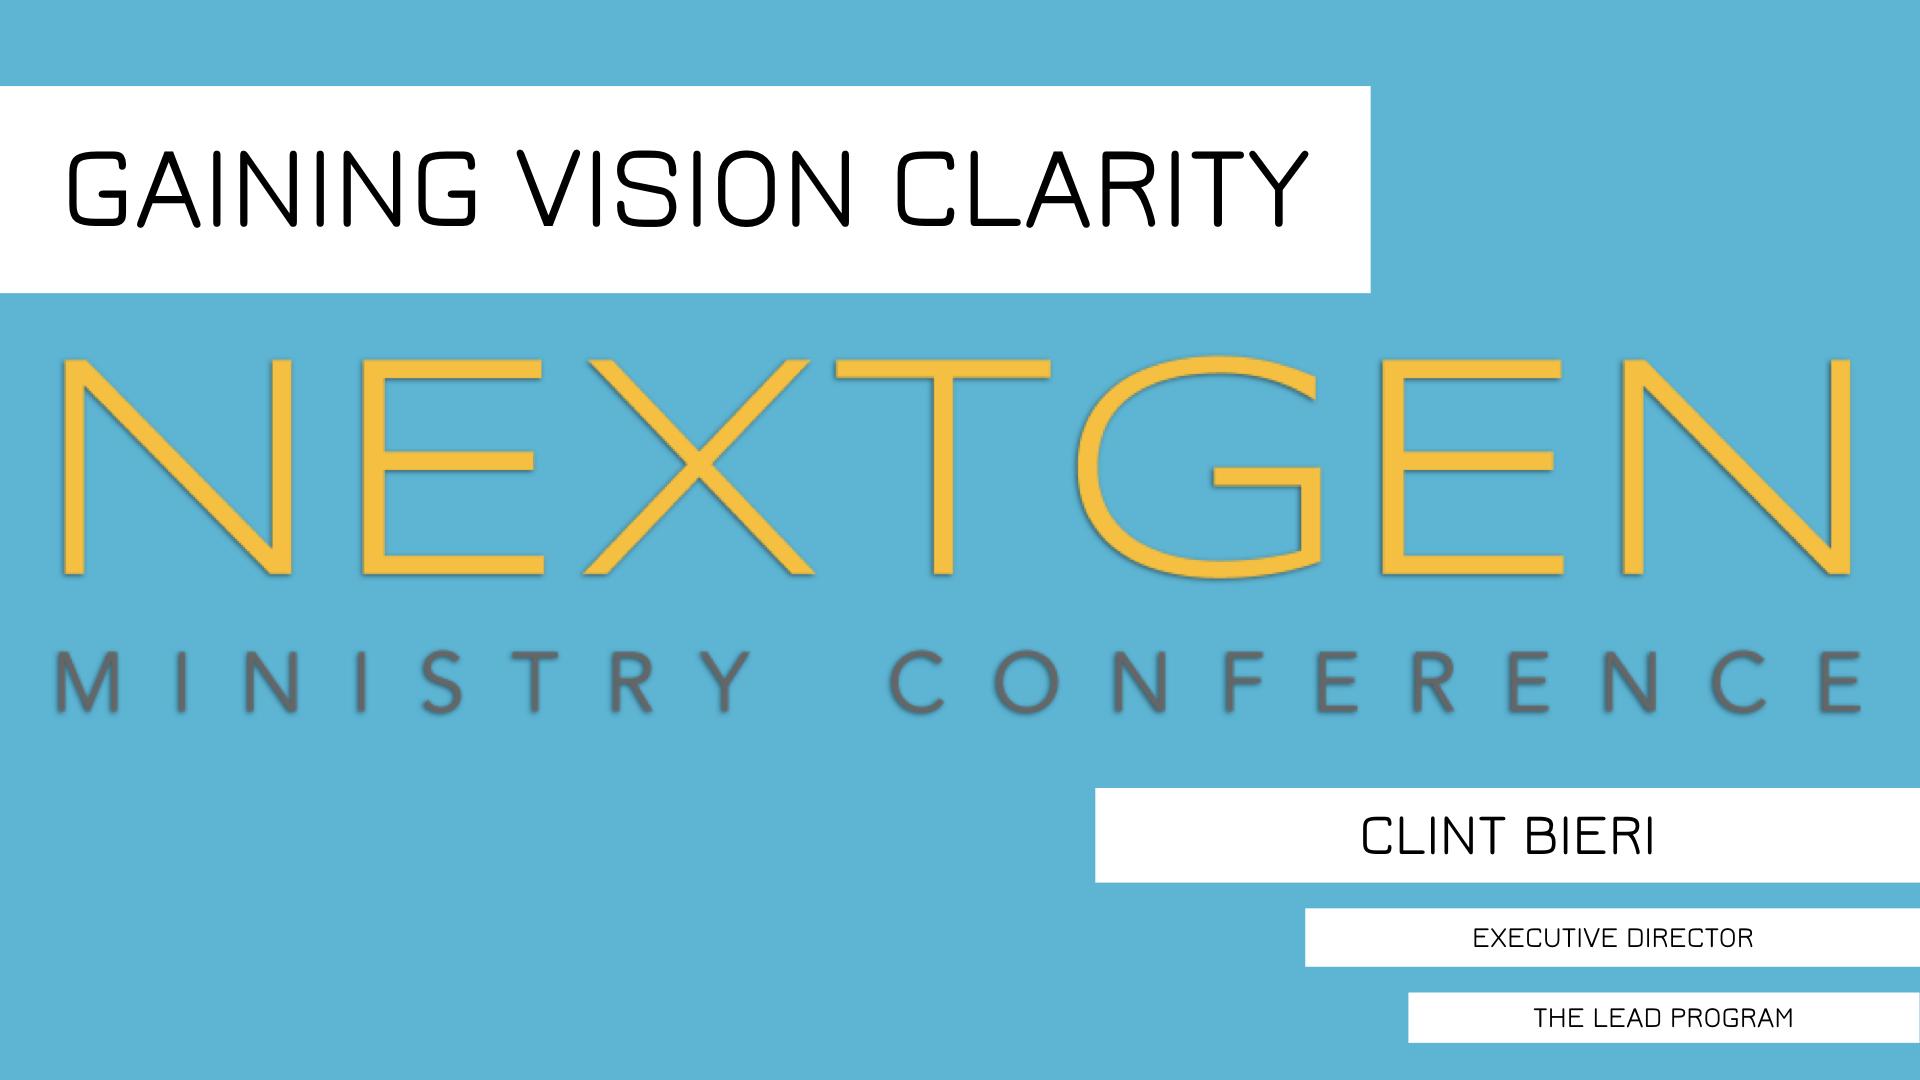 NEXTGEN Ministry Conference